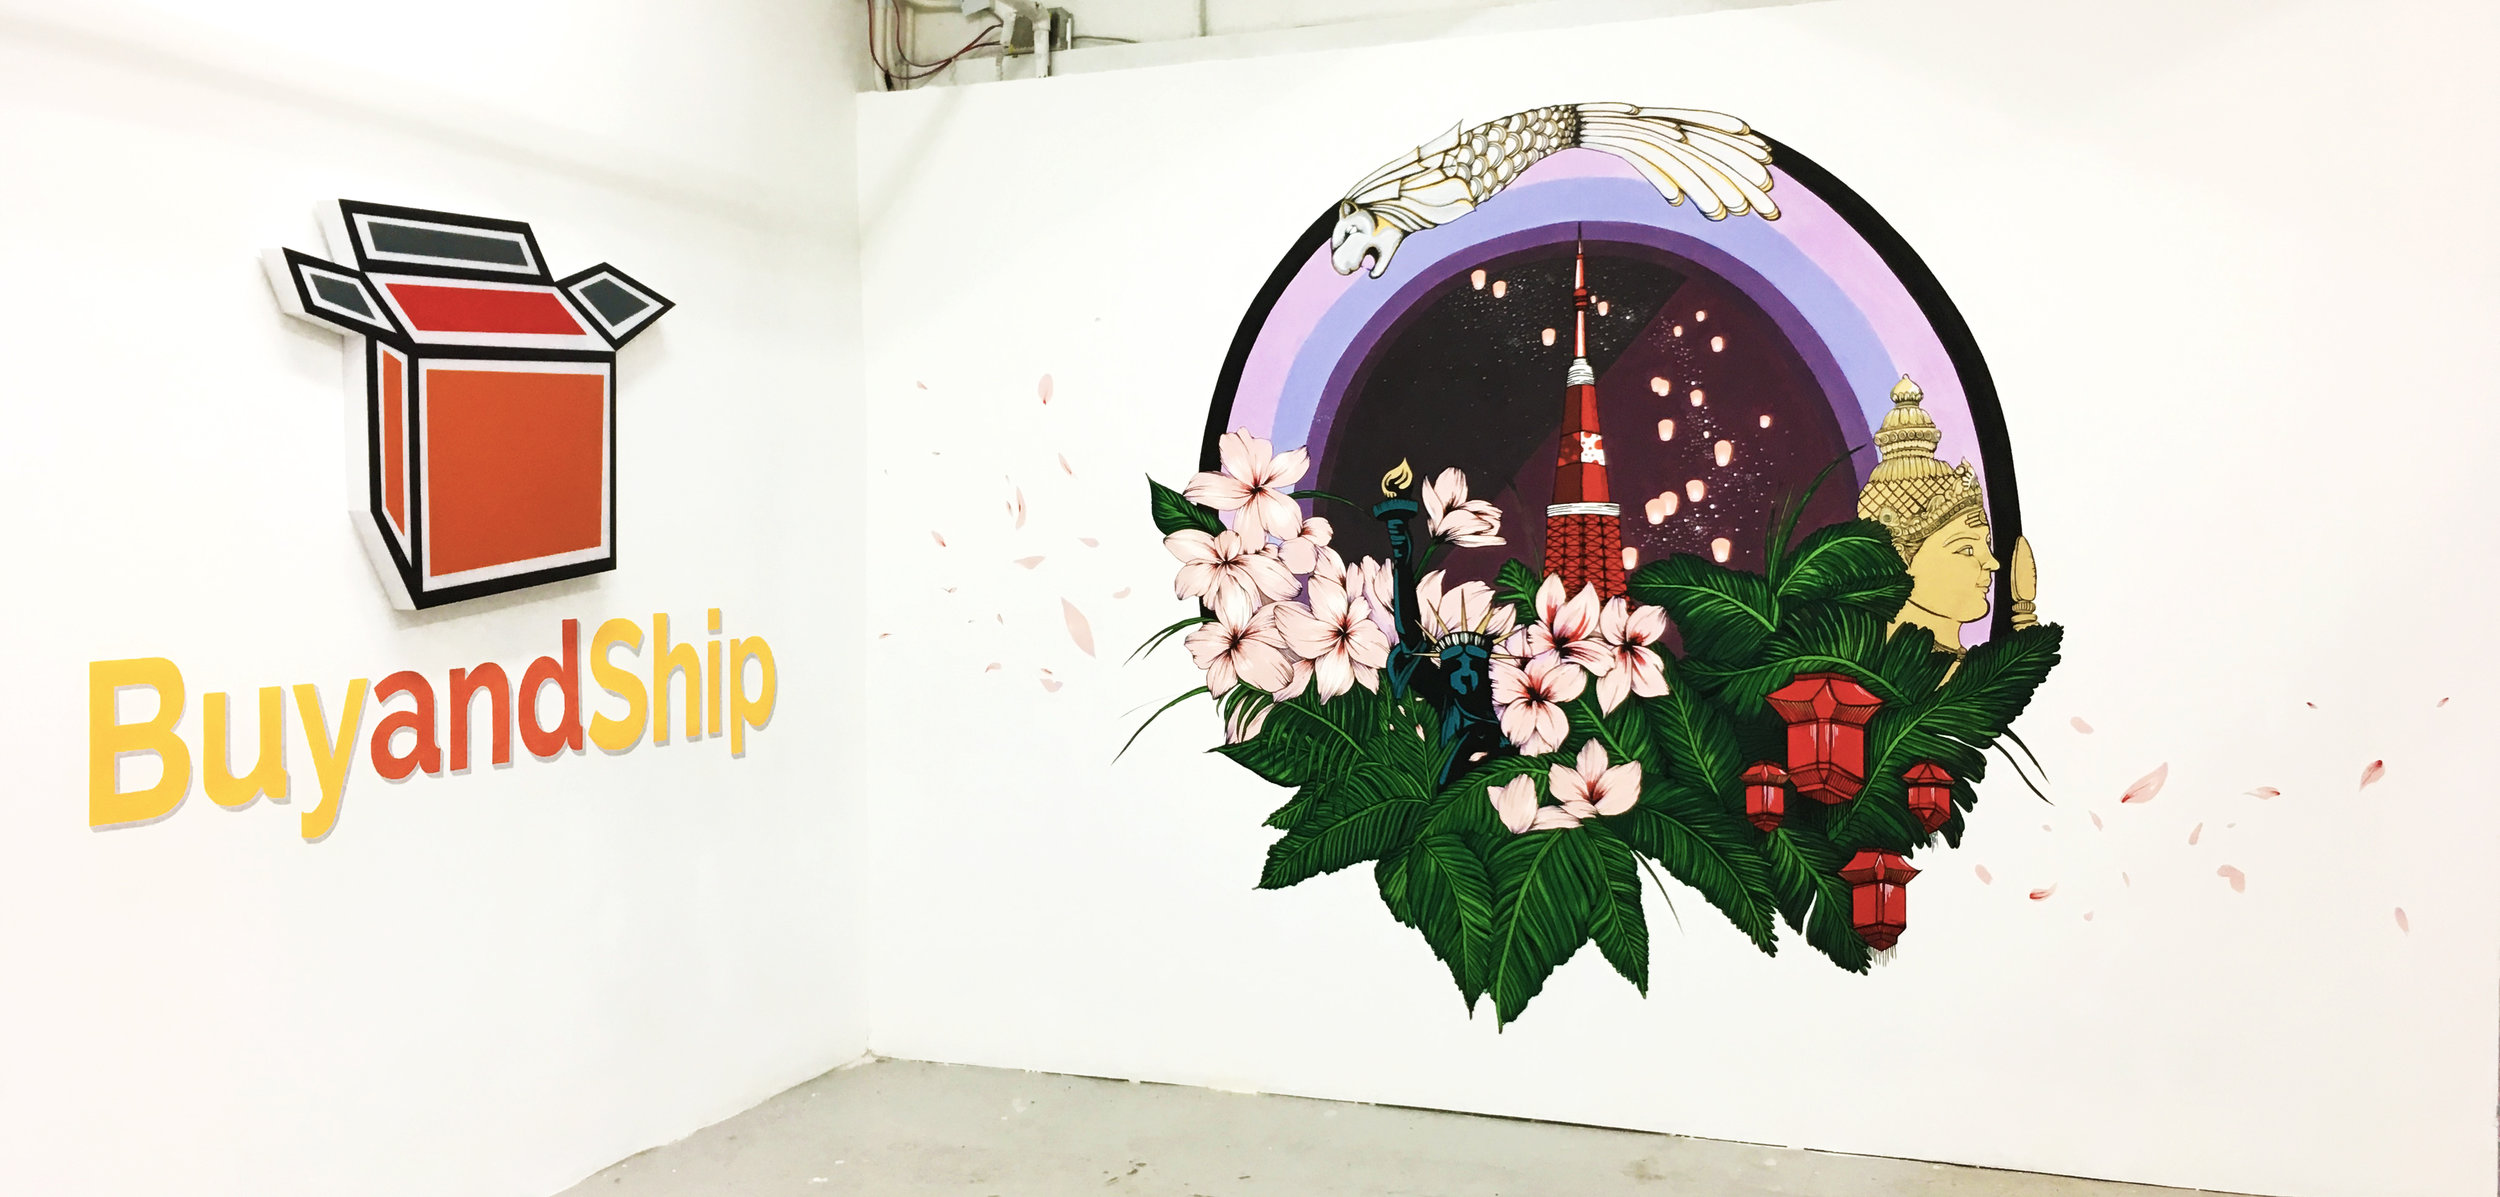 Mural | Sign lettering: BuyandShip